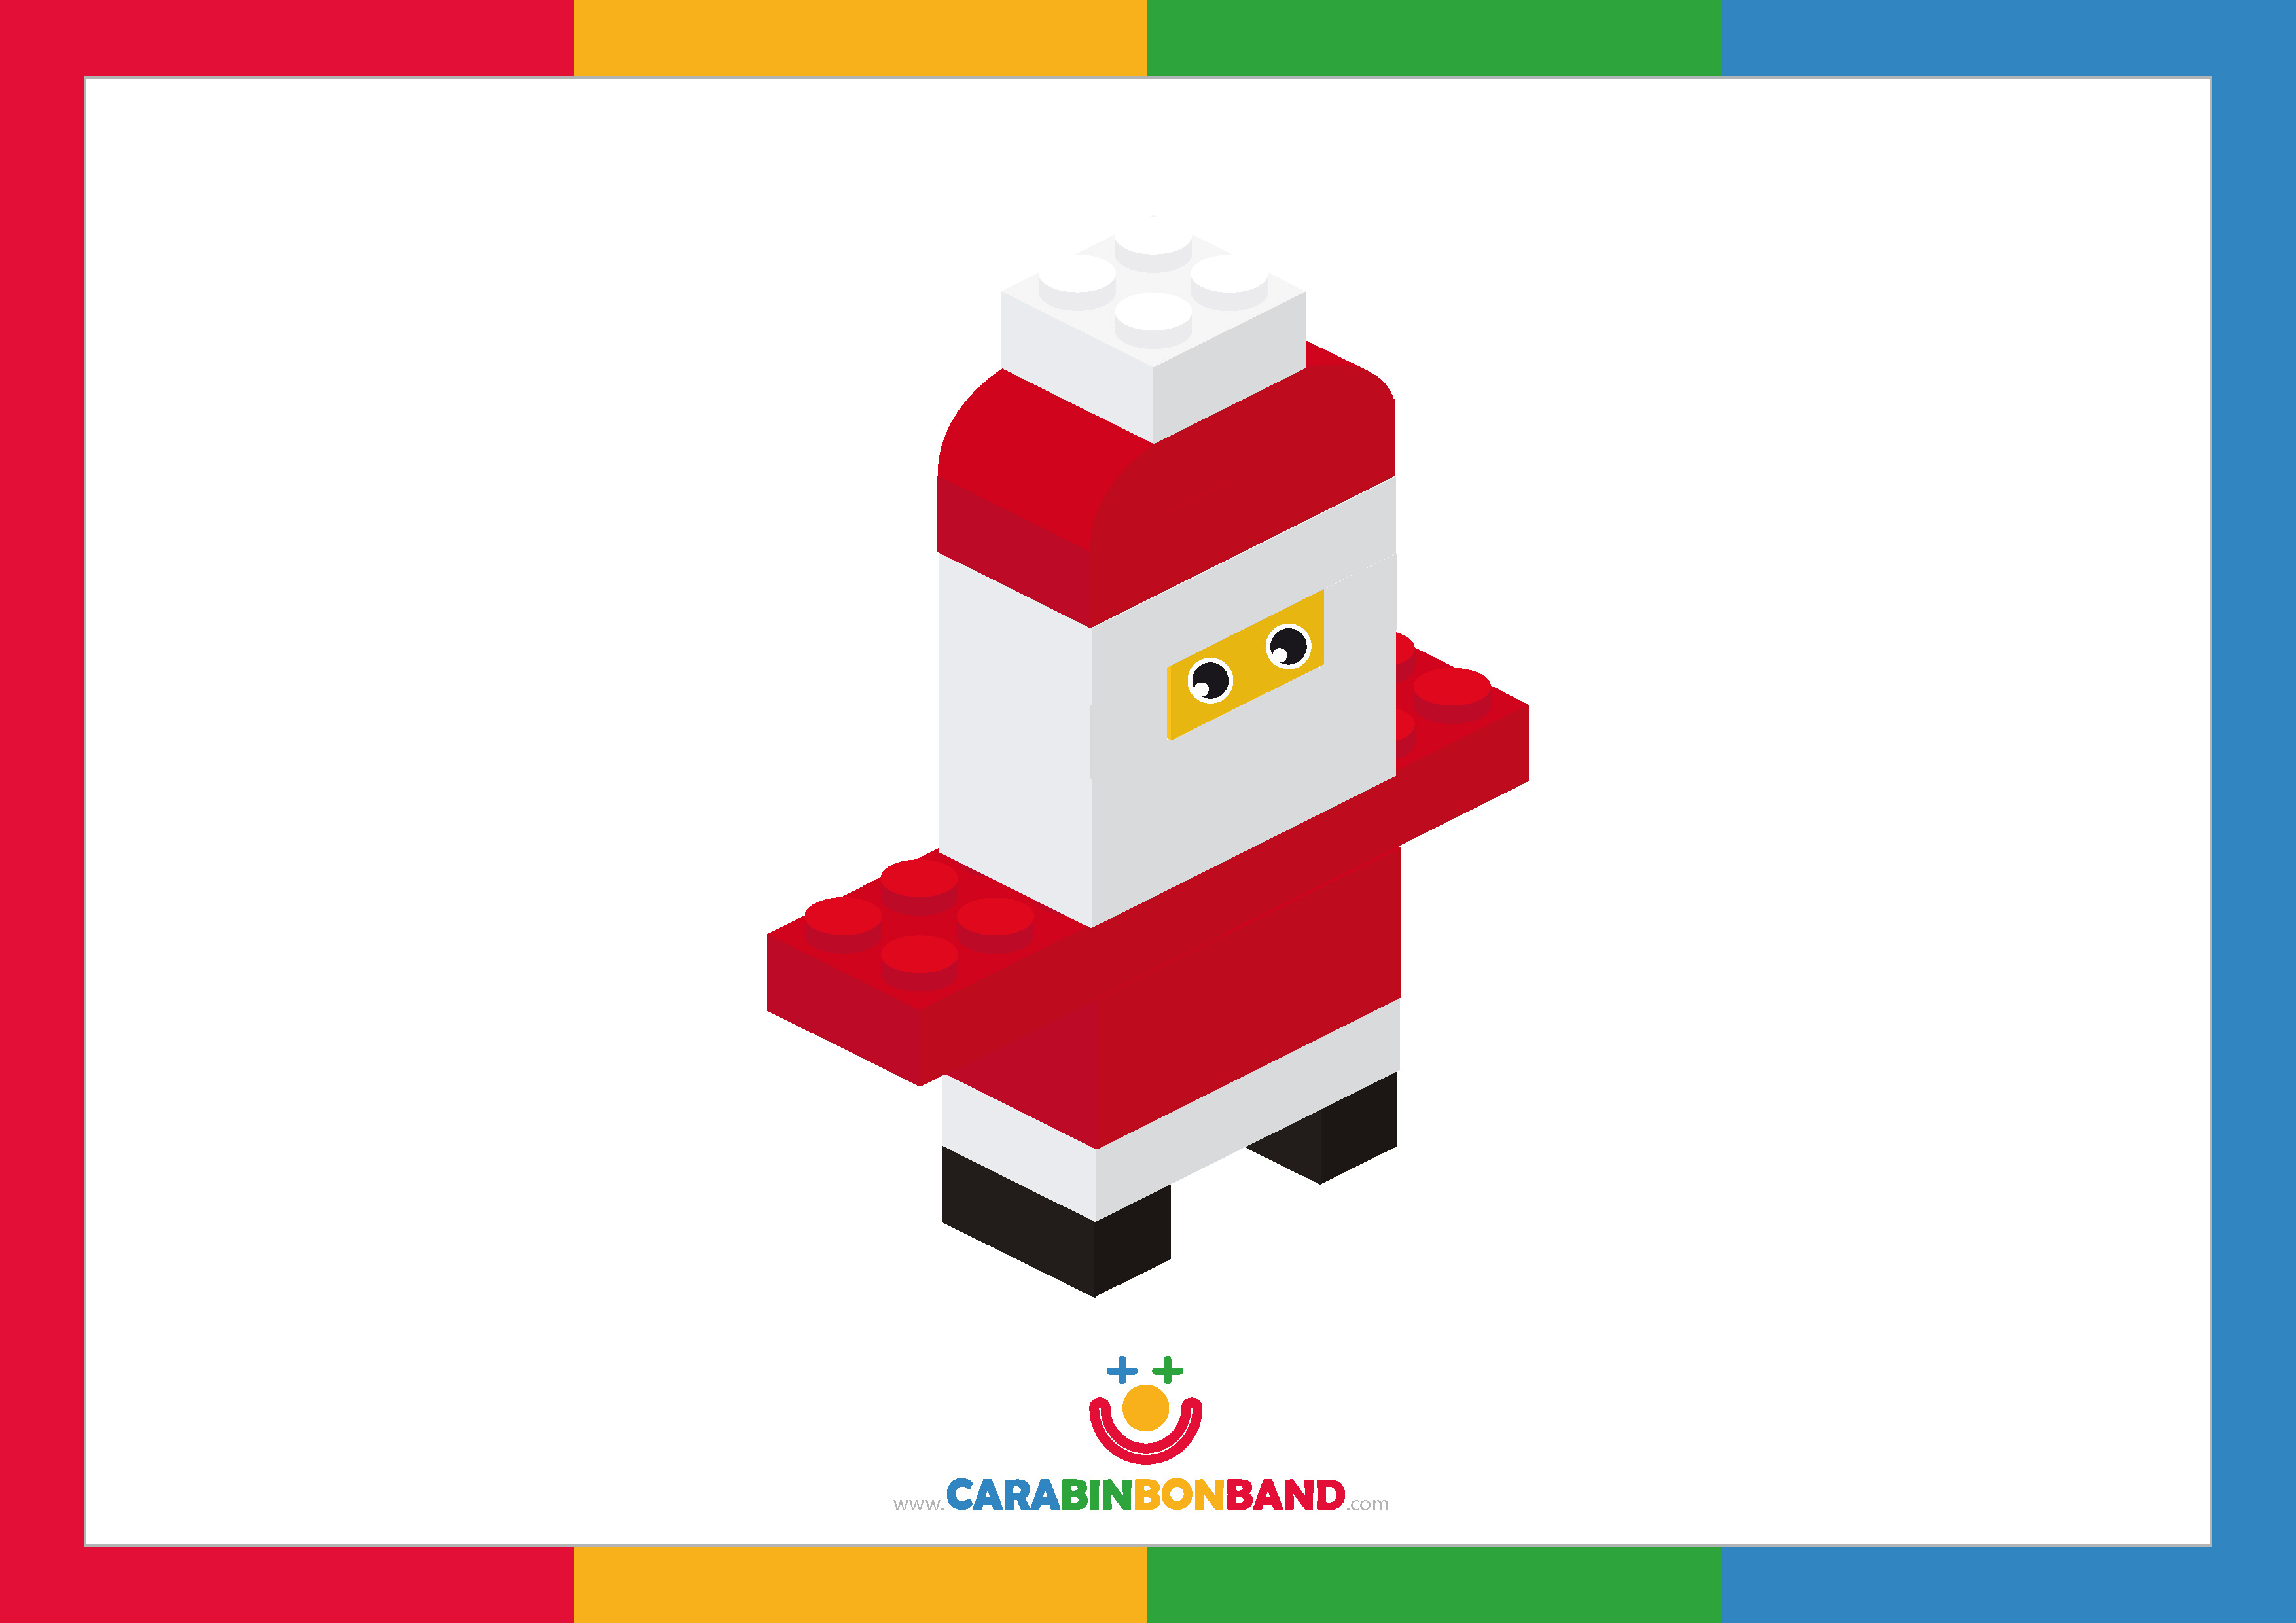 Láminas decorativas: Santa Claus con bloques Lego